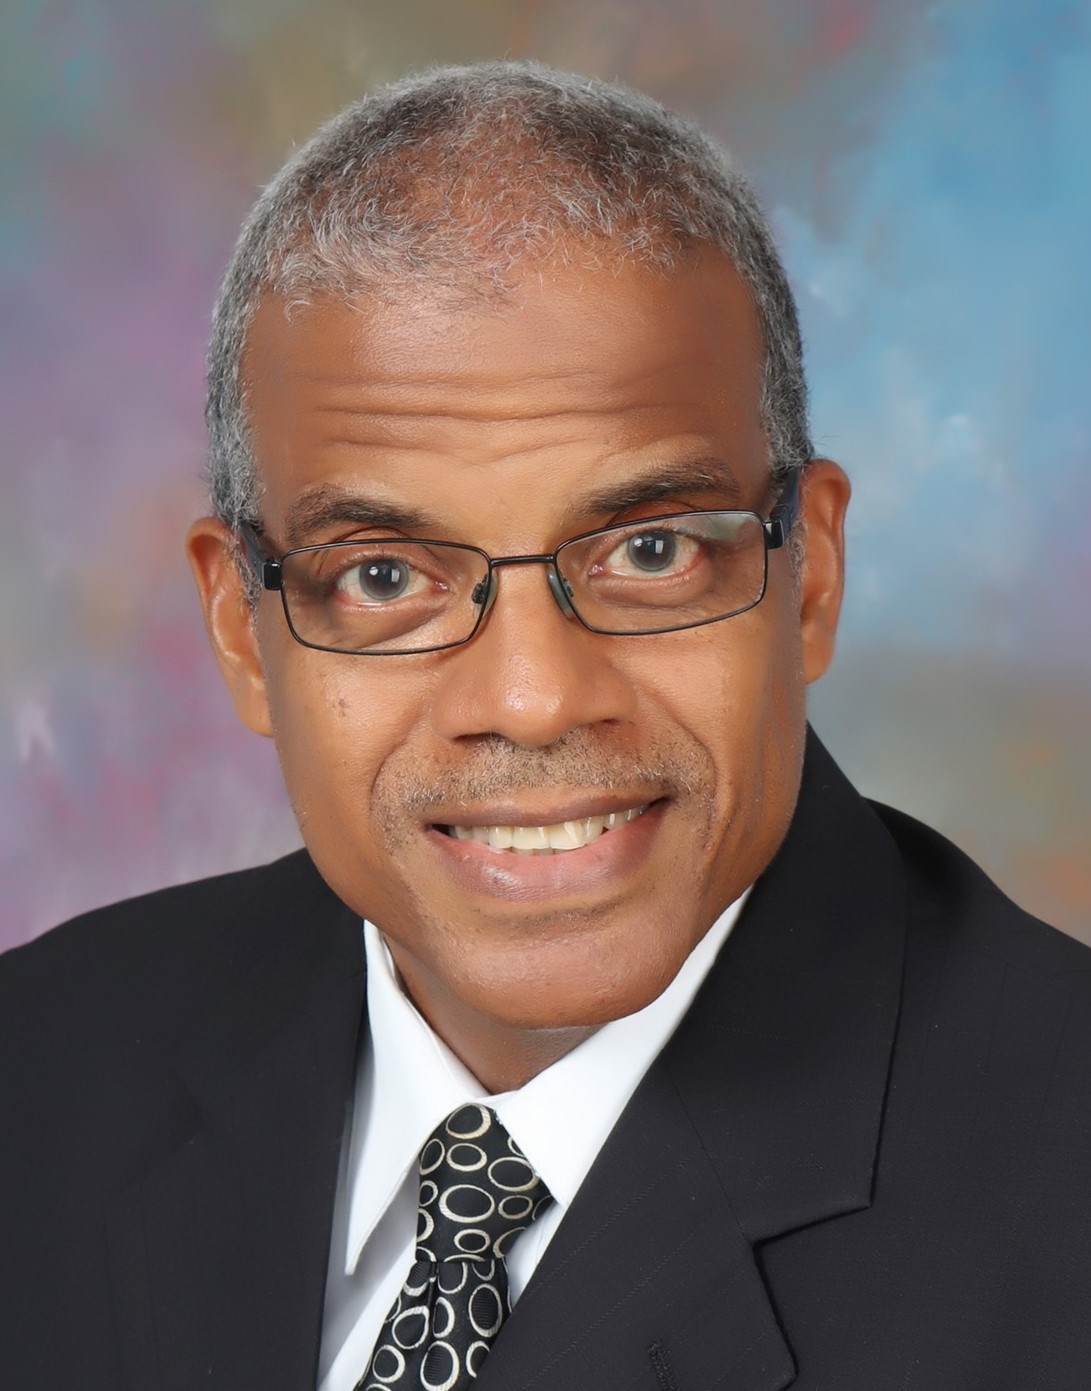 Michael Fitz-Henley, M.B.B.S., D.M.